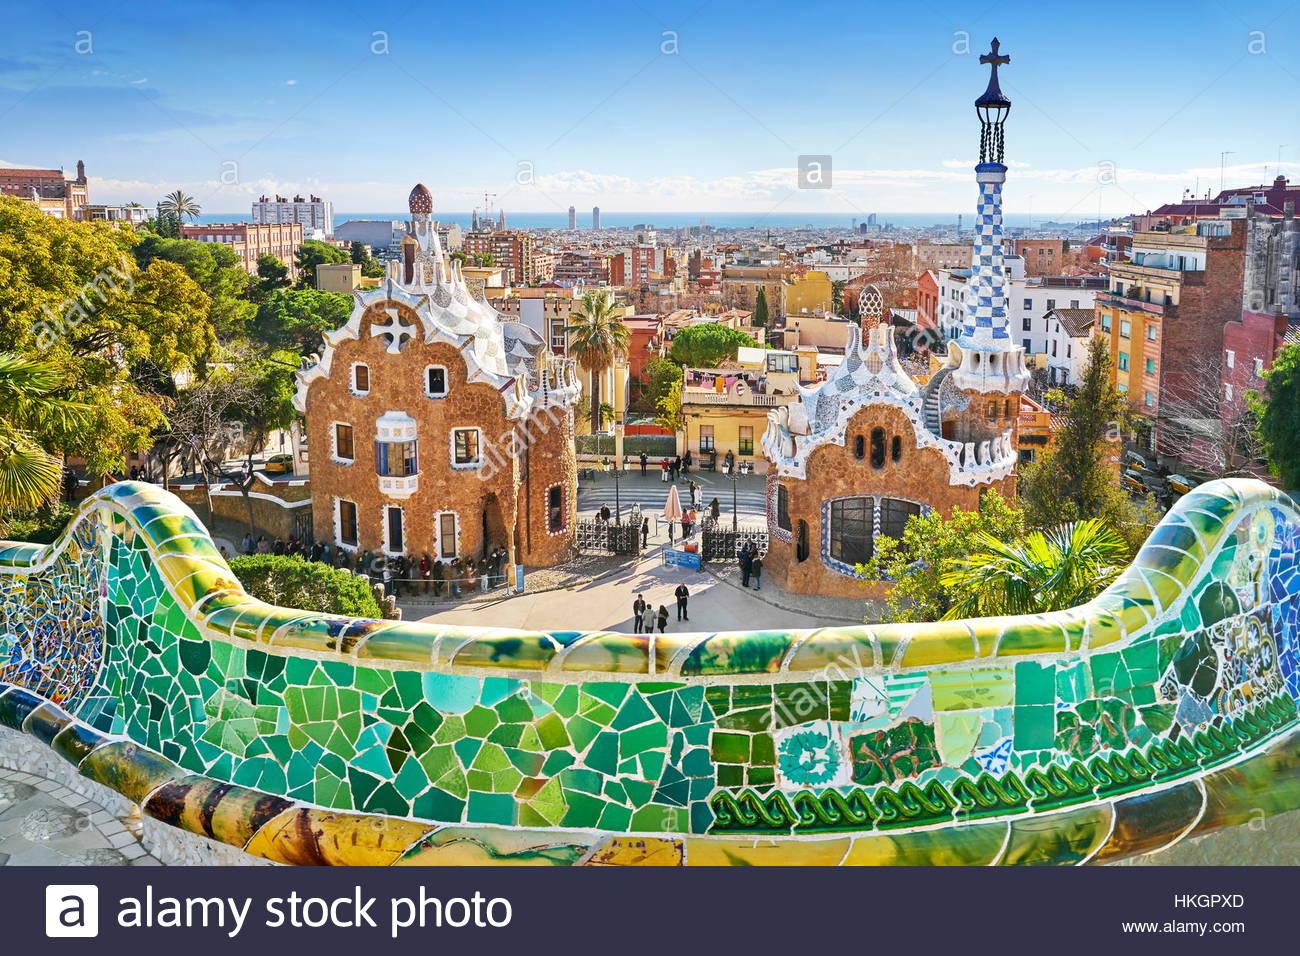 Barcelona - Parque Güell de Antoni Gaudí, Cataluña, España Imagen De Stock